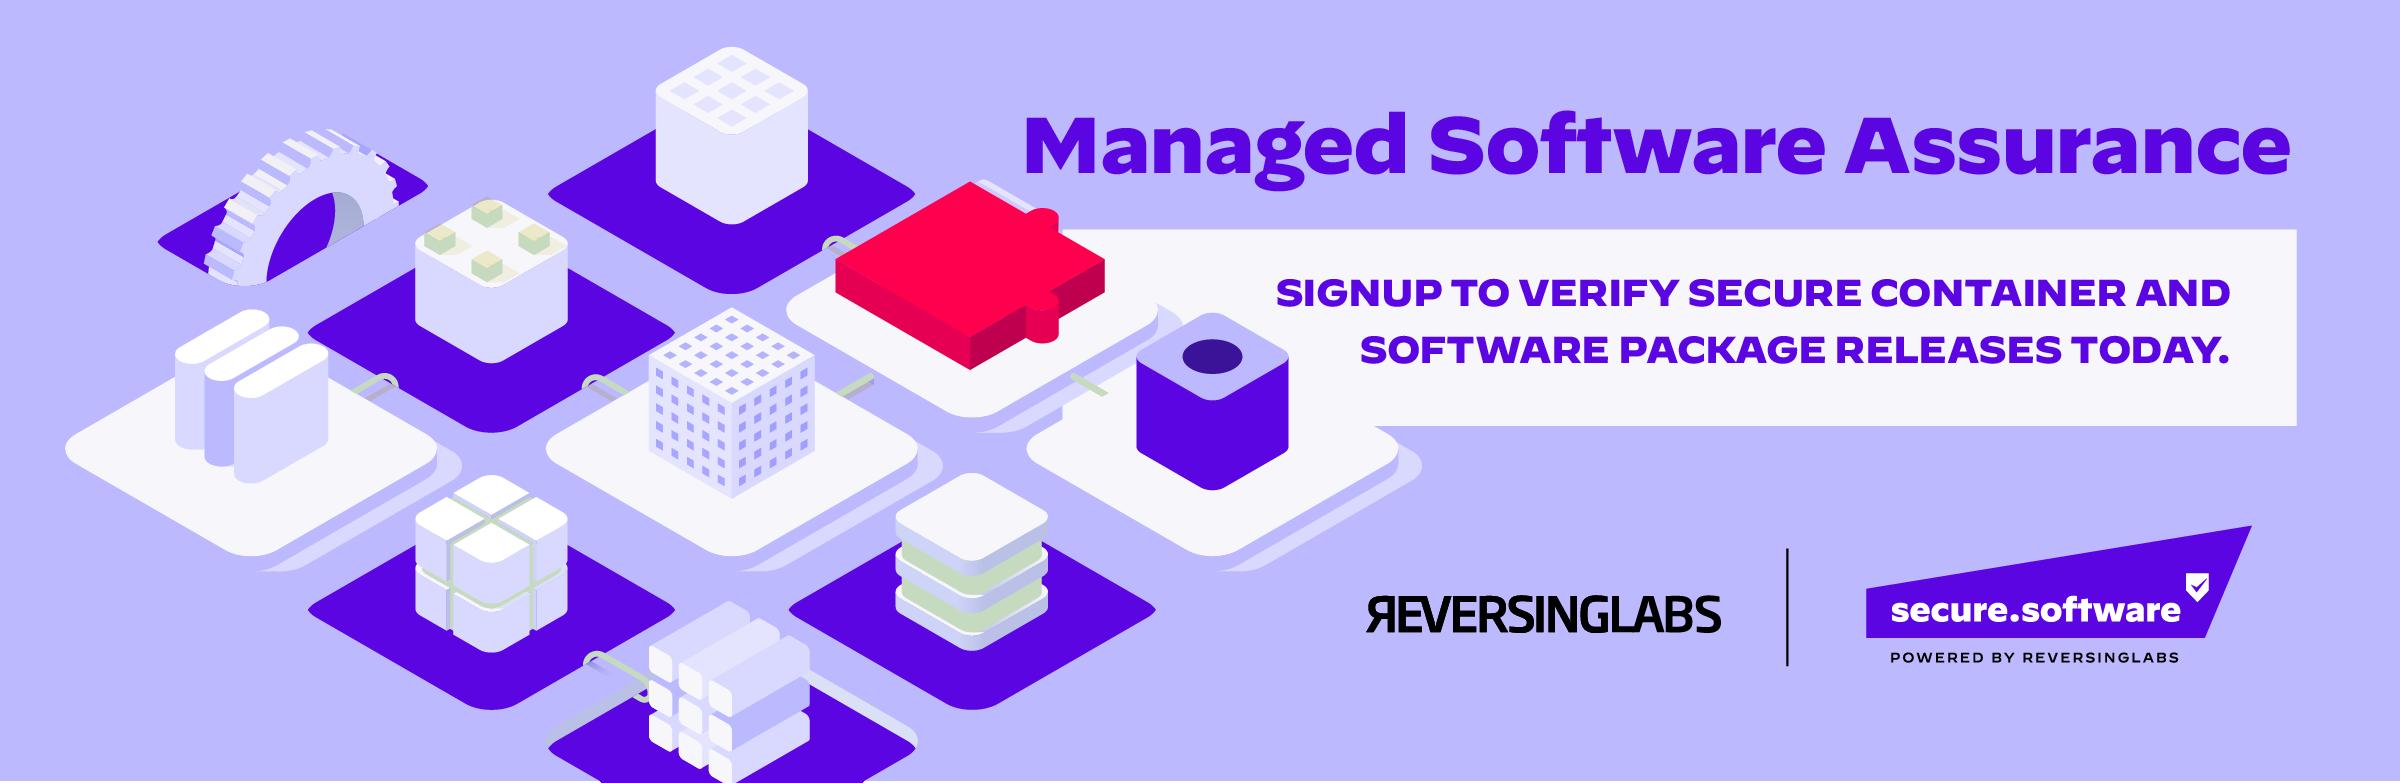 Managed Software Assurance